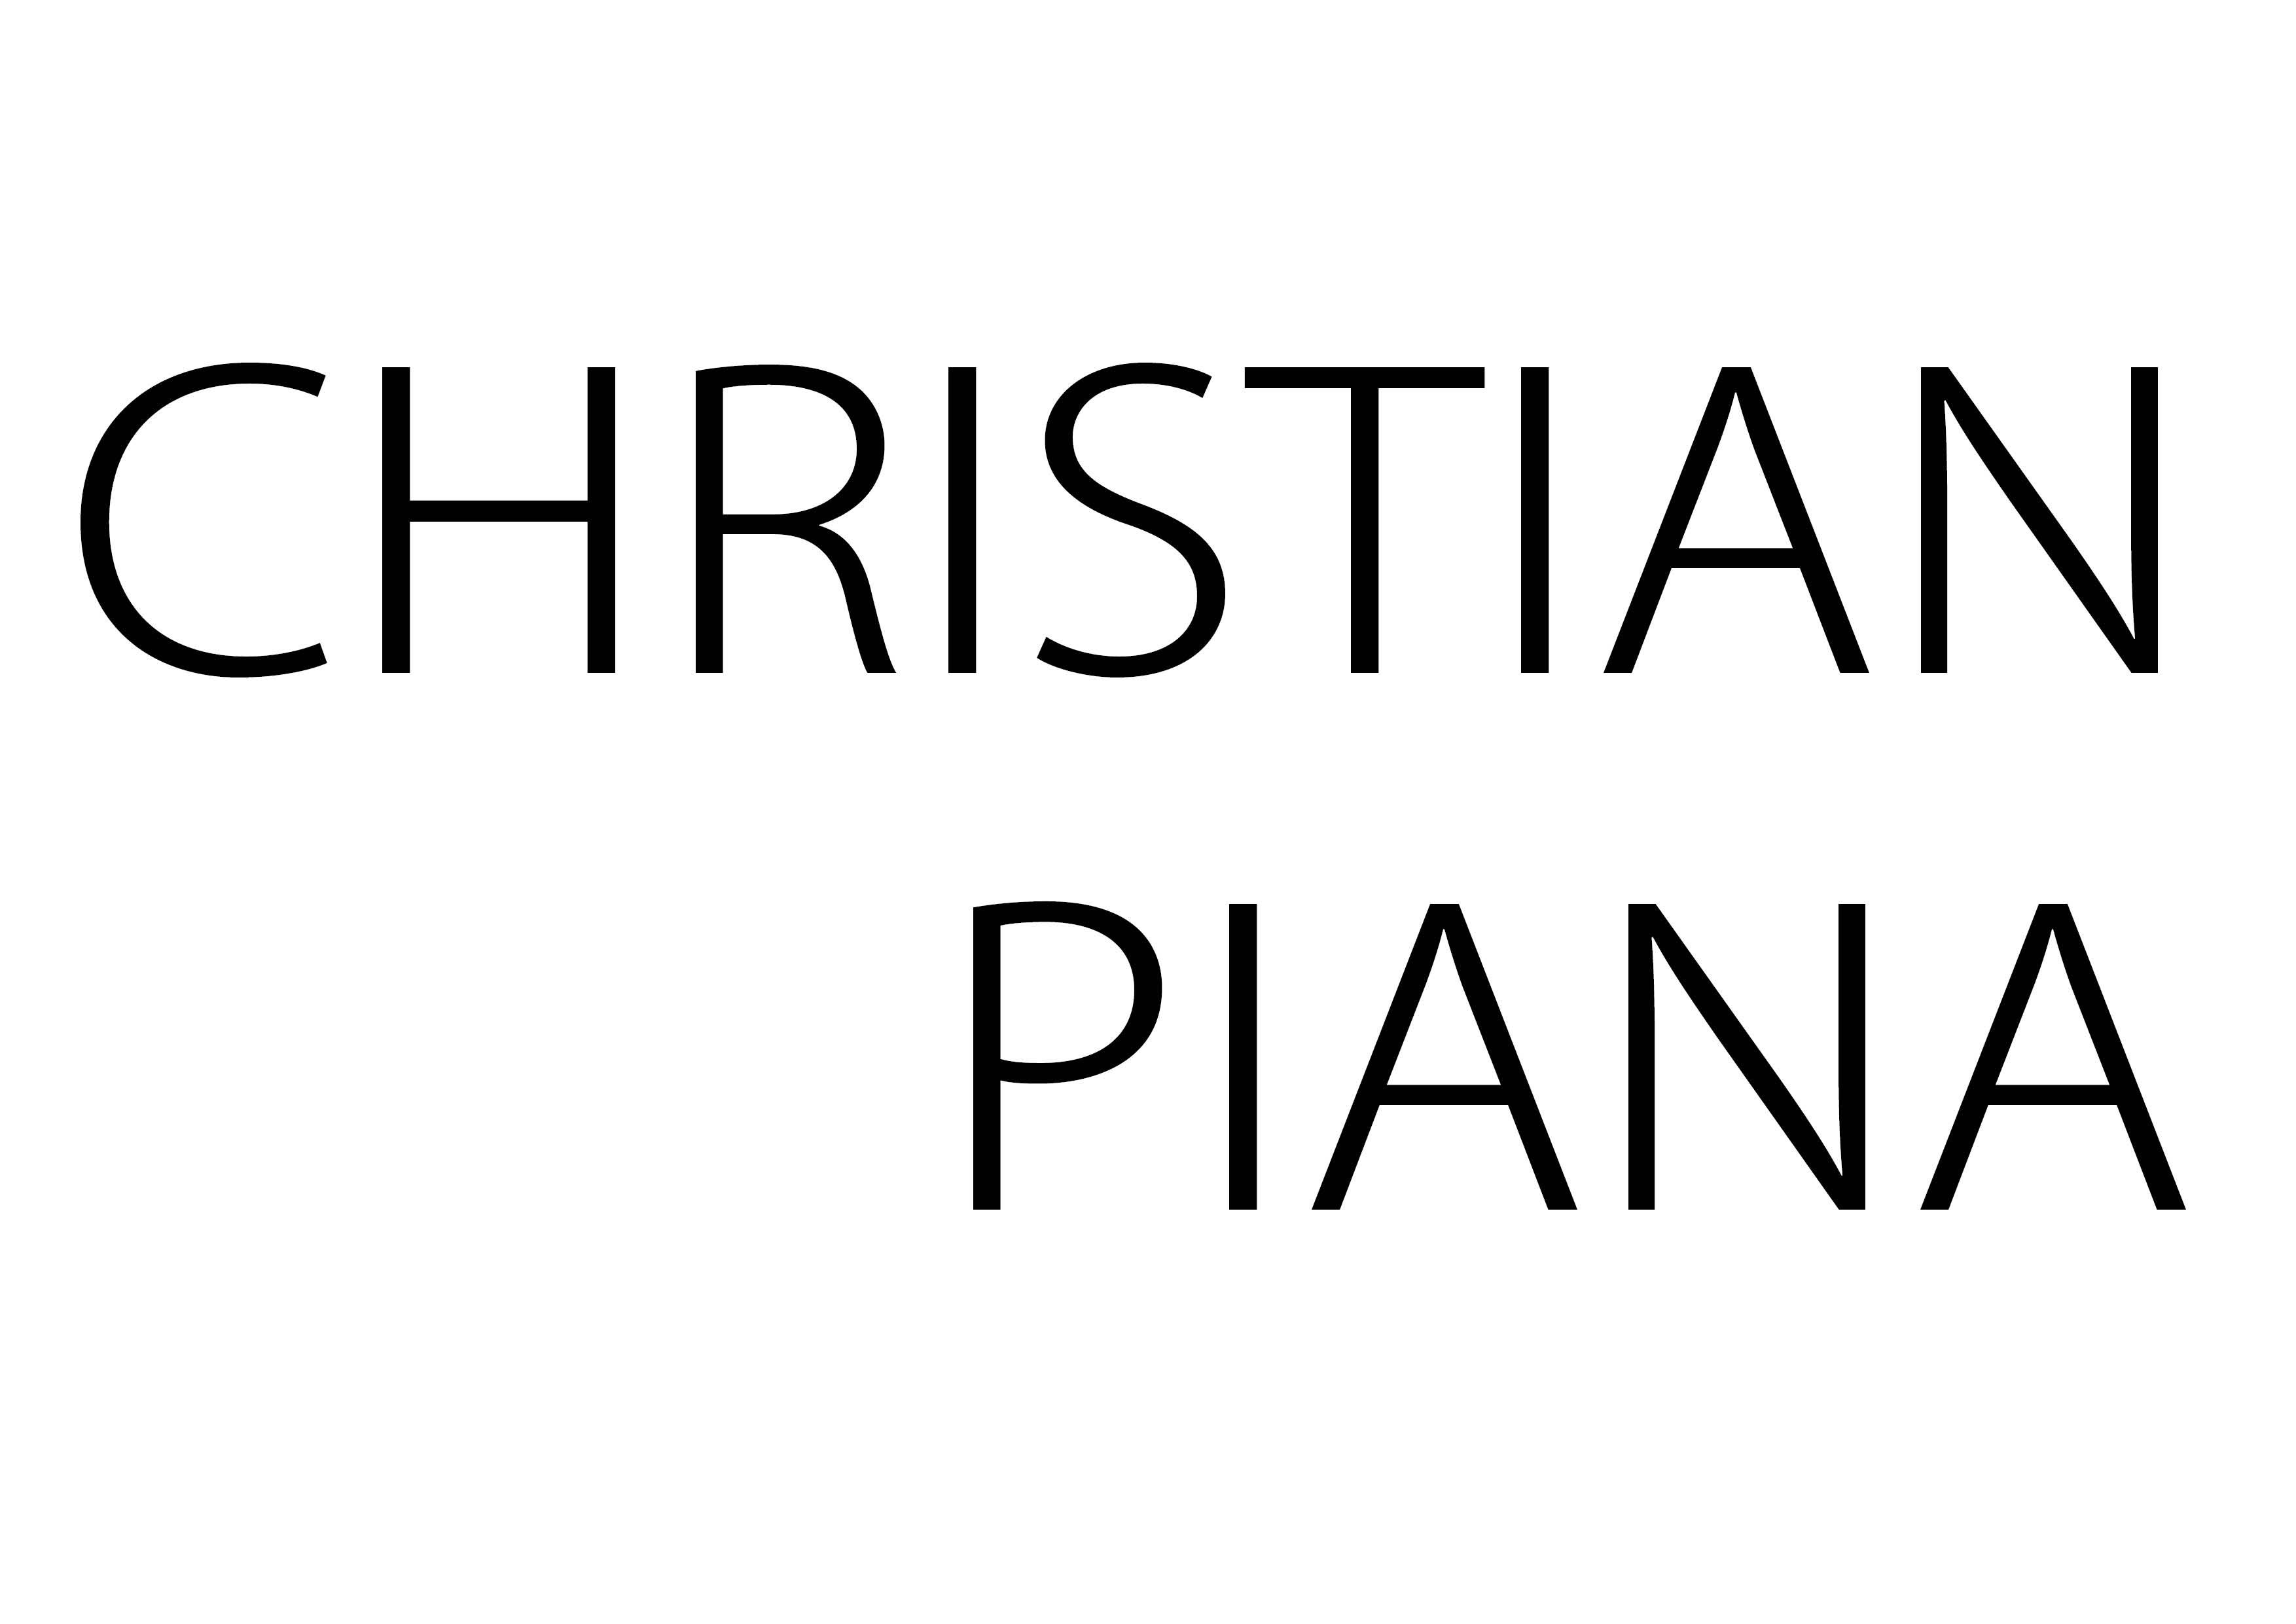 Christian Piana